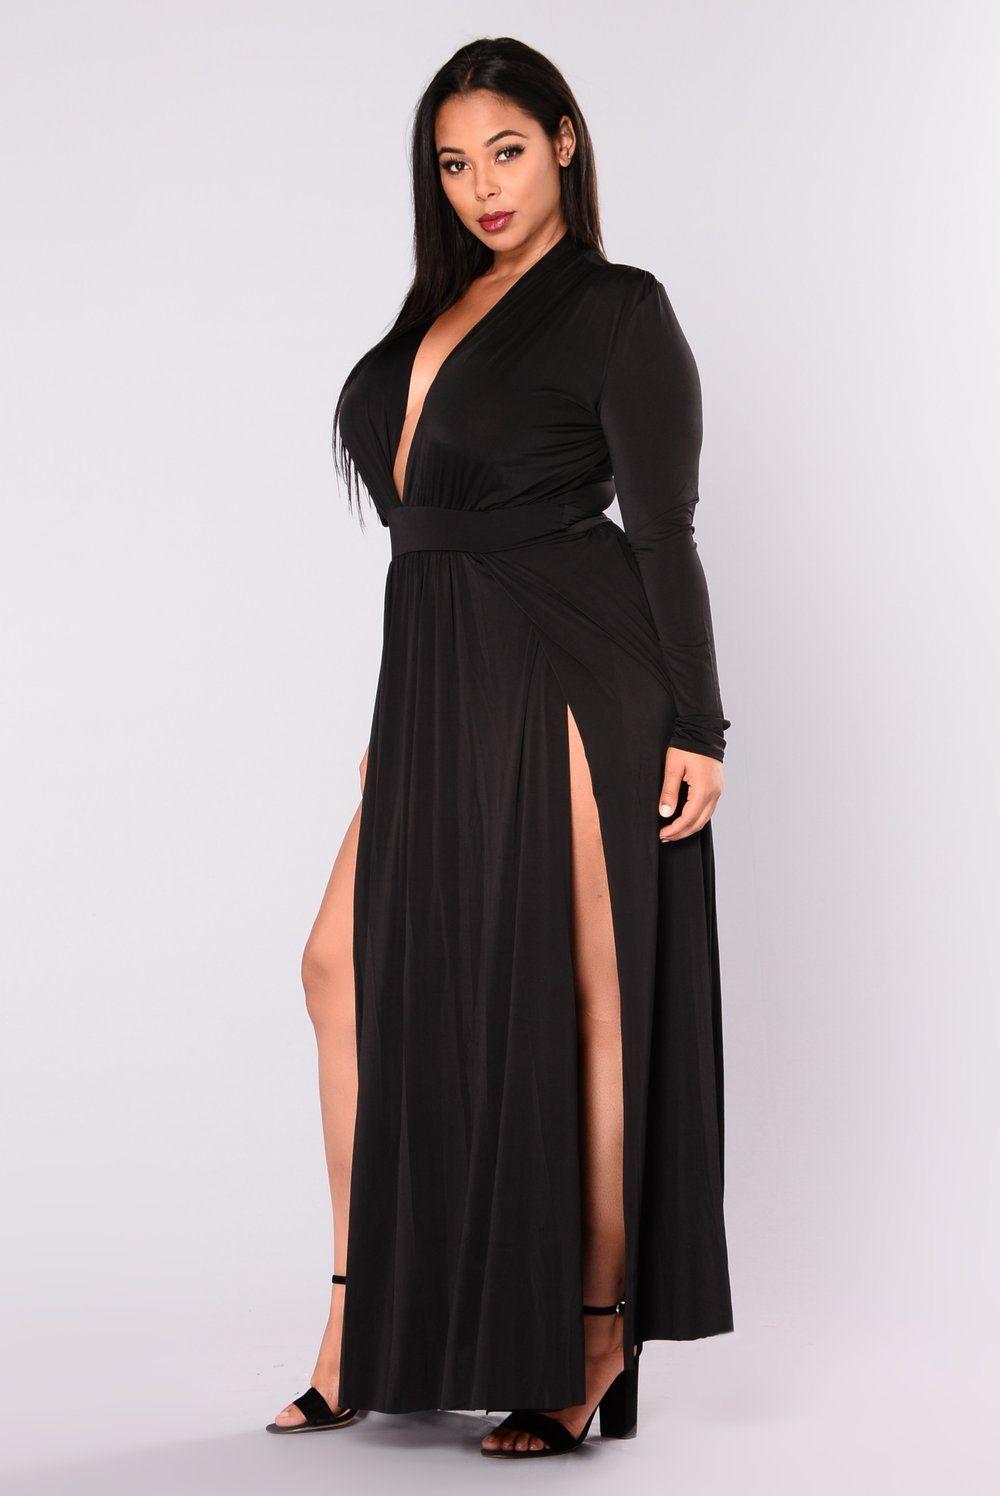 959e8267ab5 Spree Dress - Black